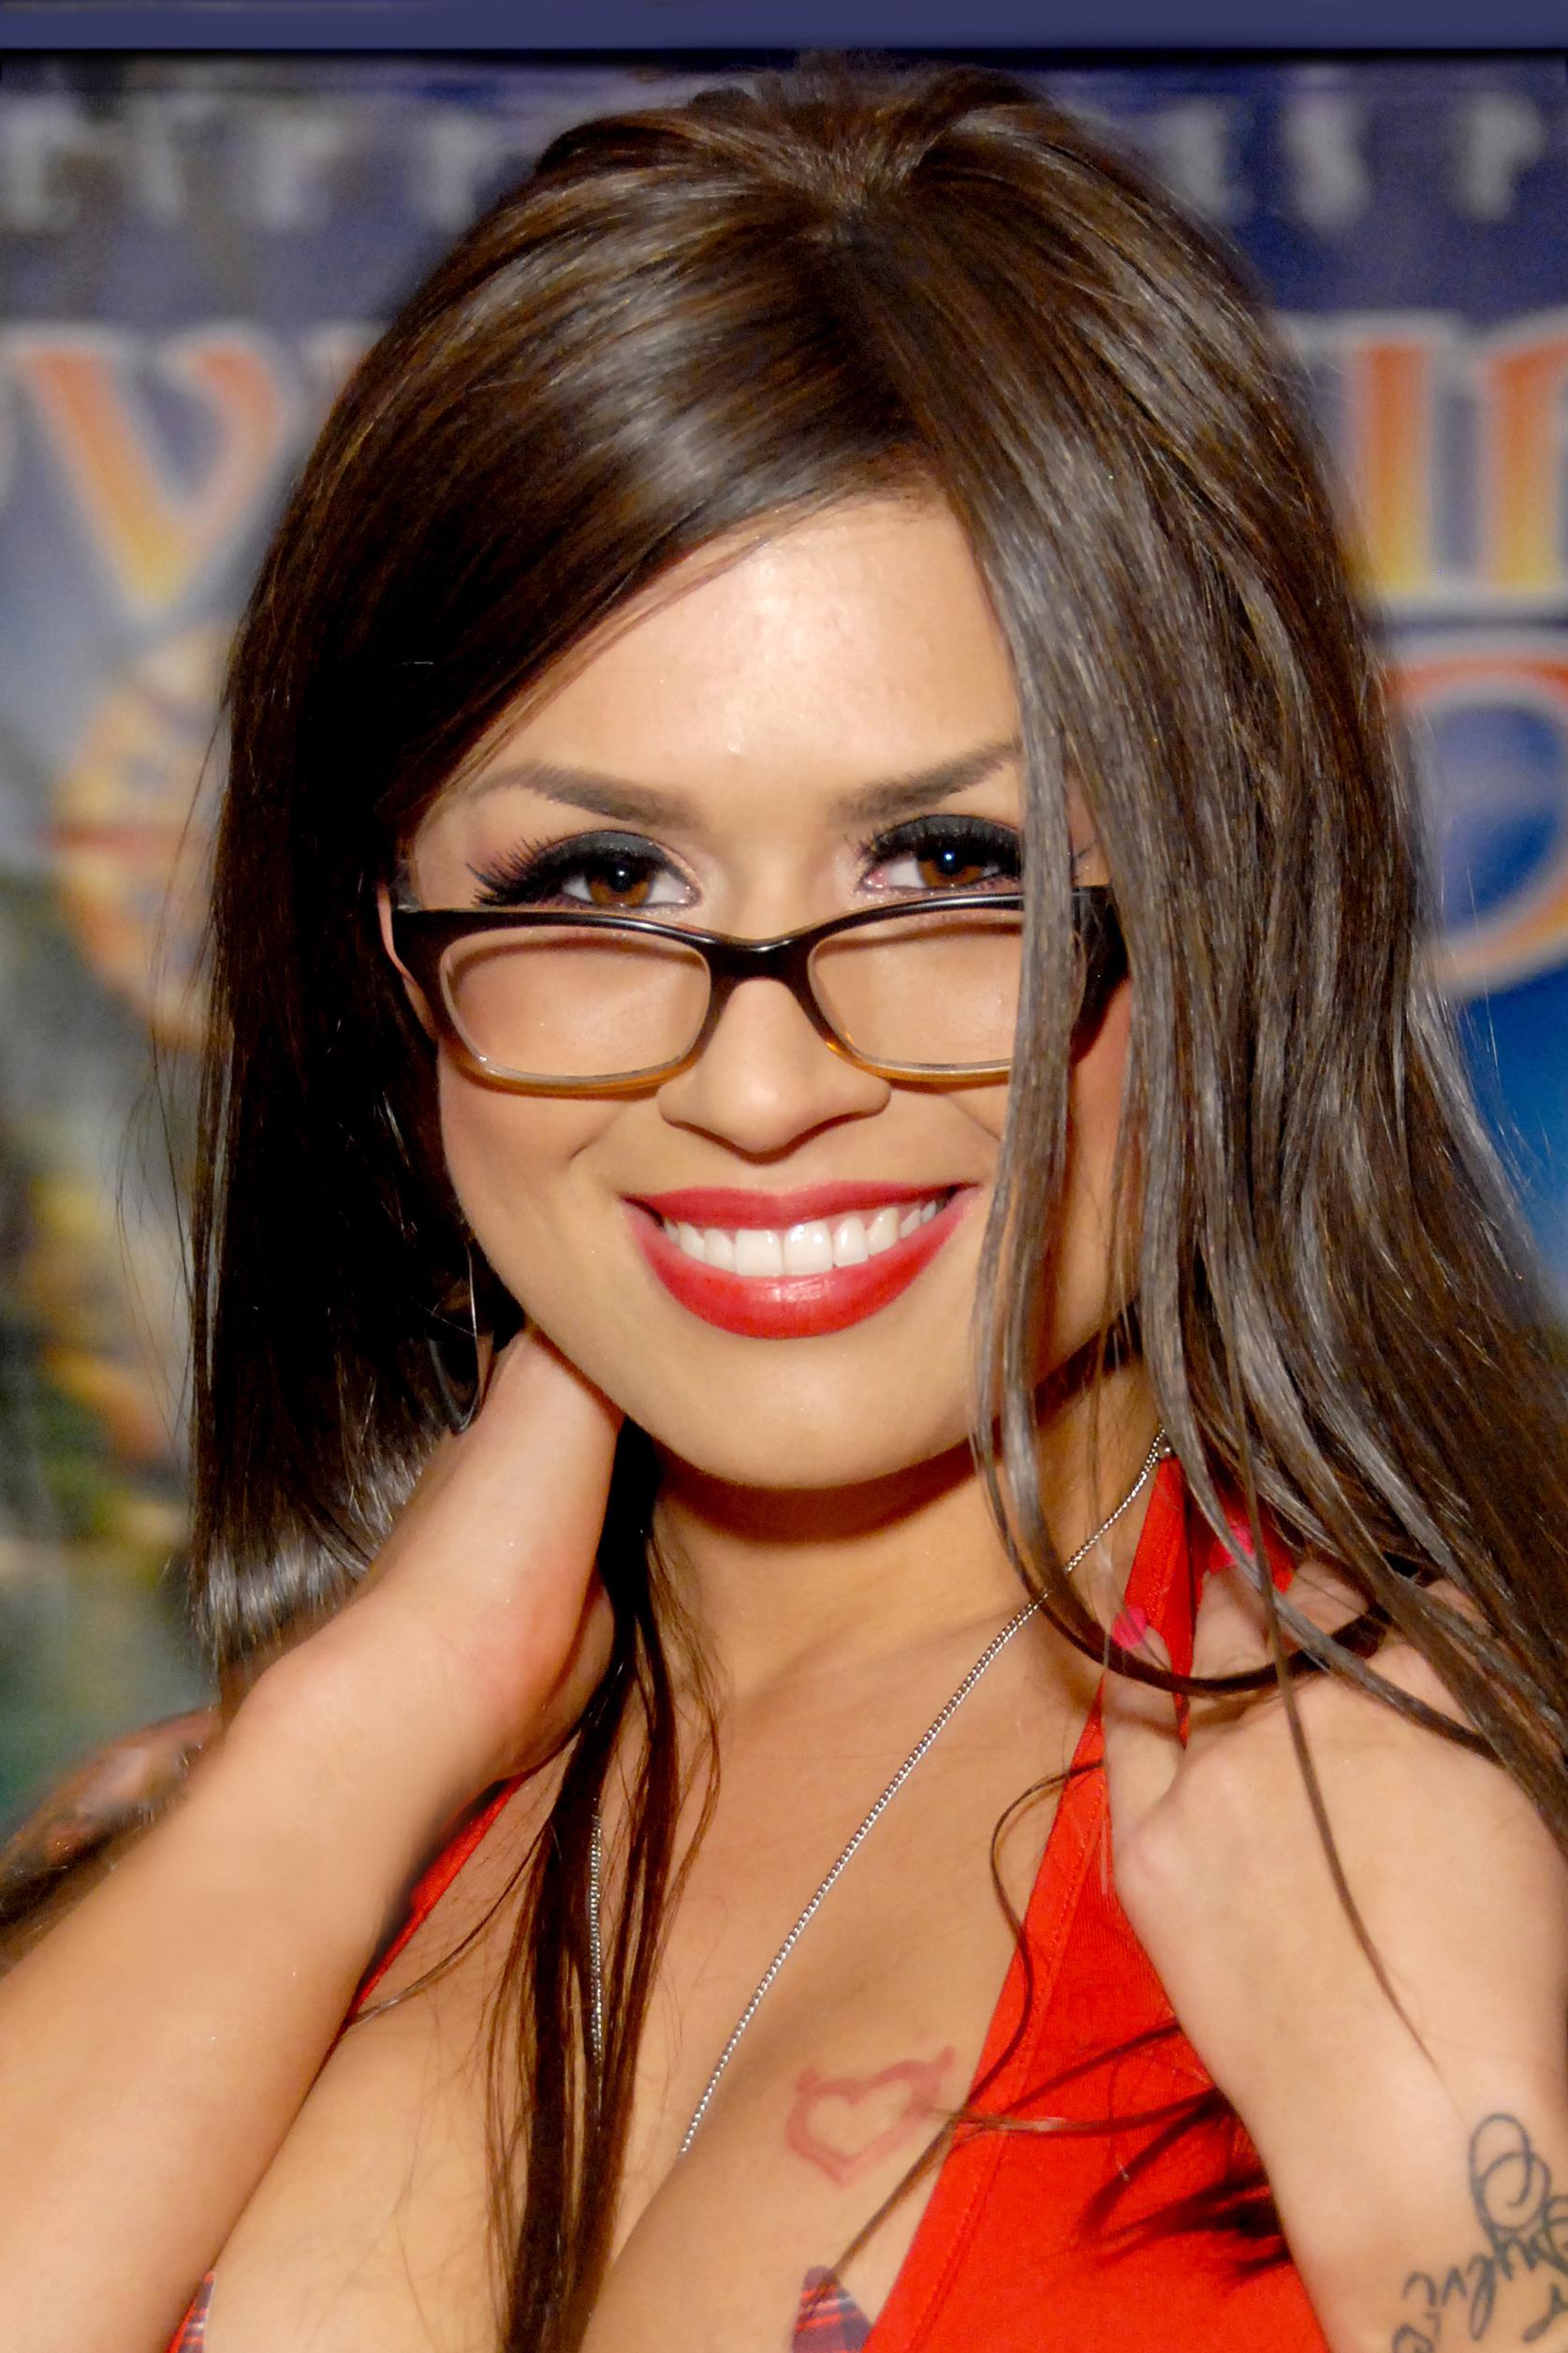 Eva Angelina Age